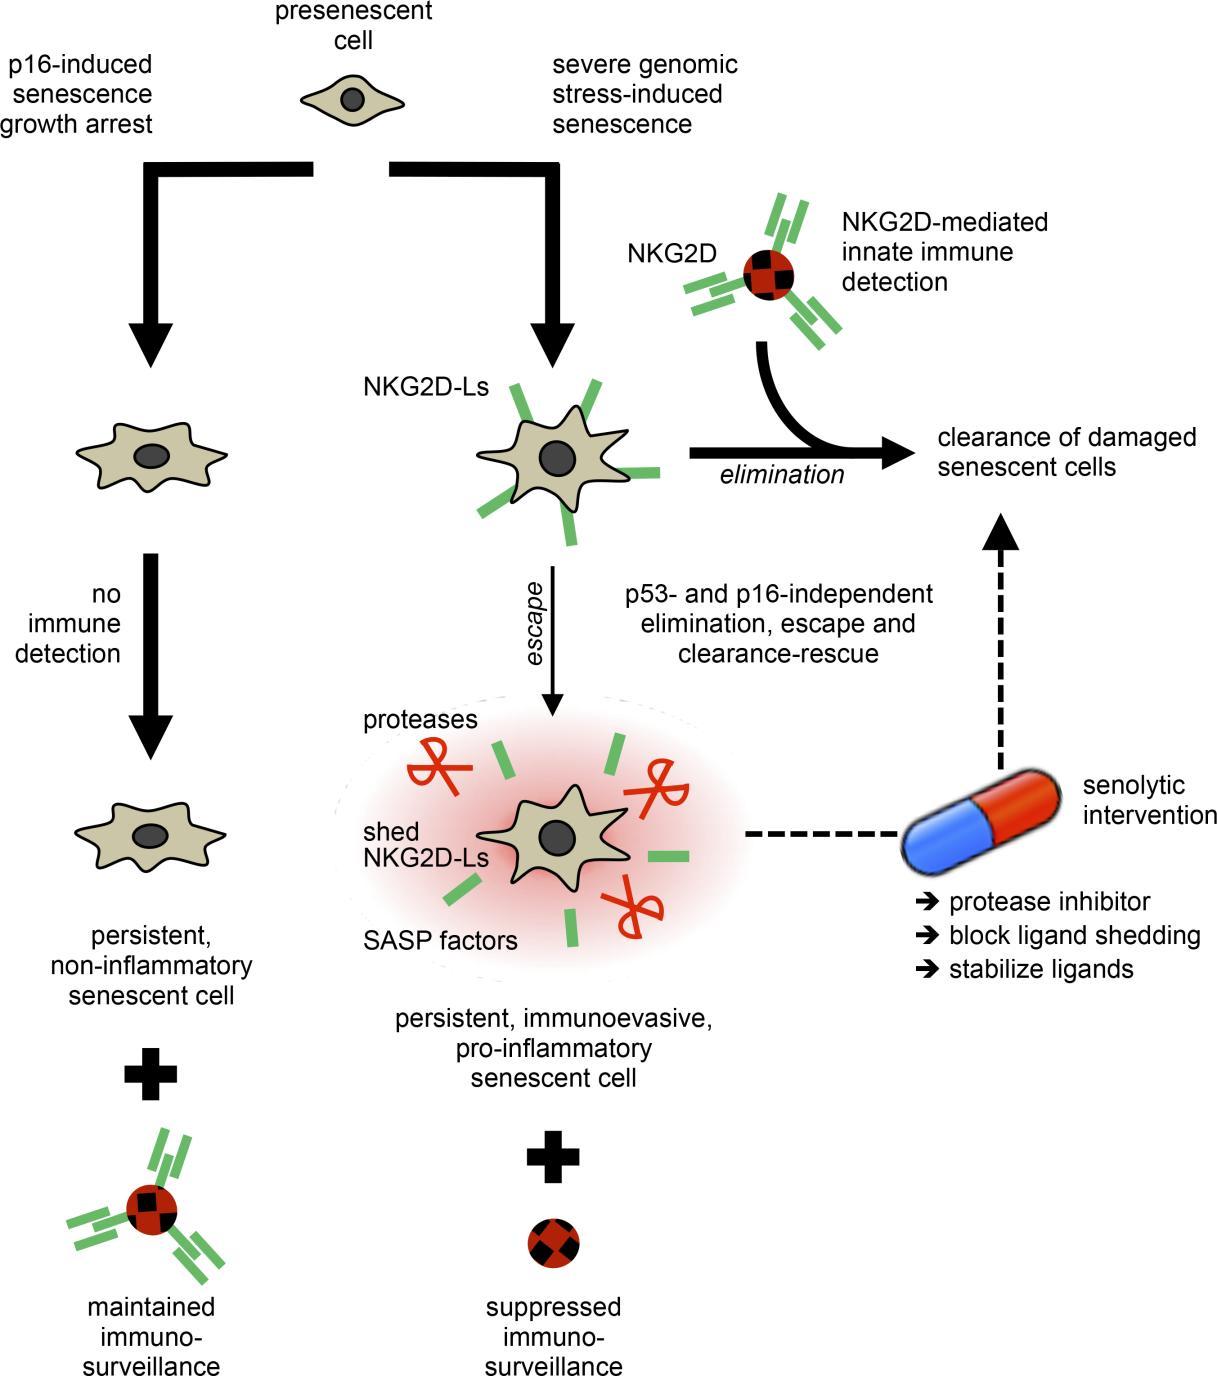 JCI Insight - Targetable mechanisms driving immunoevasion of